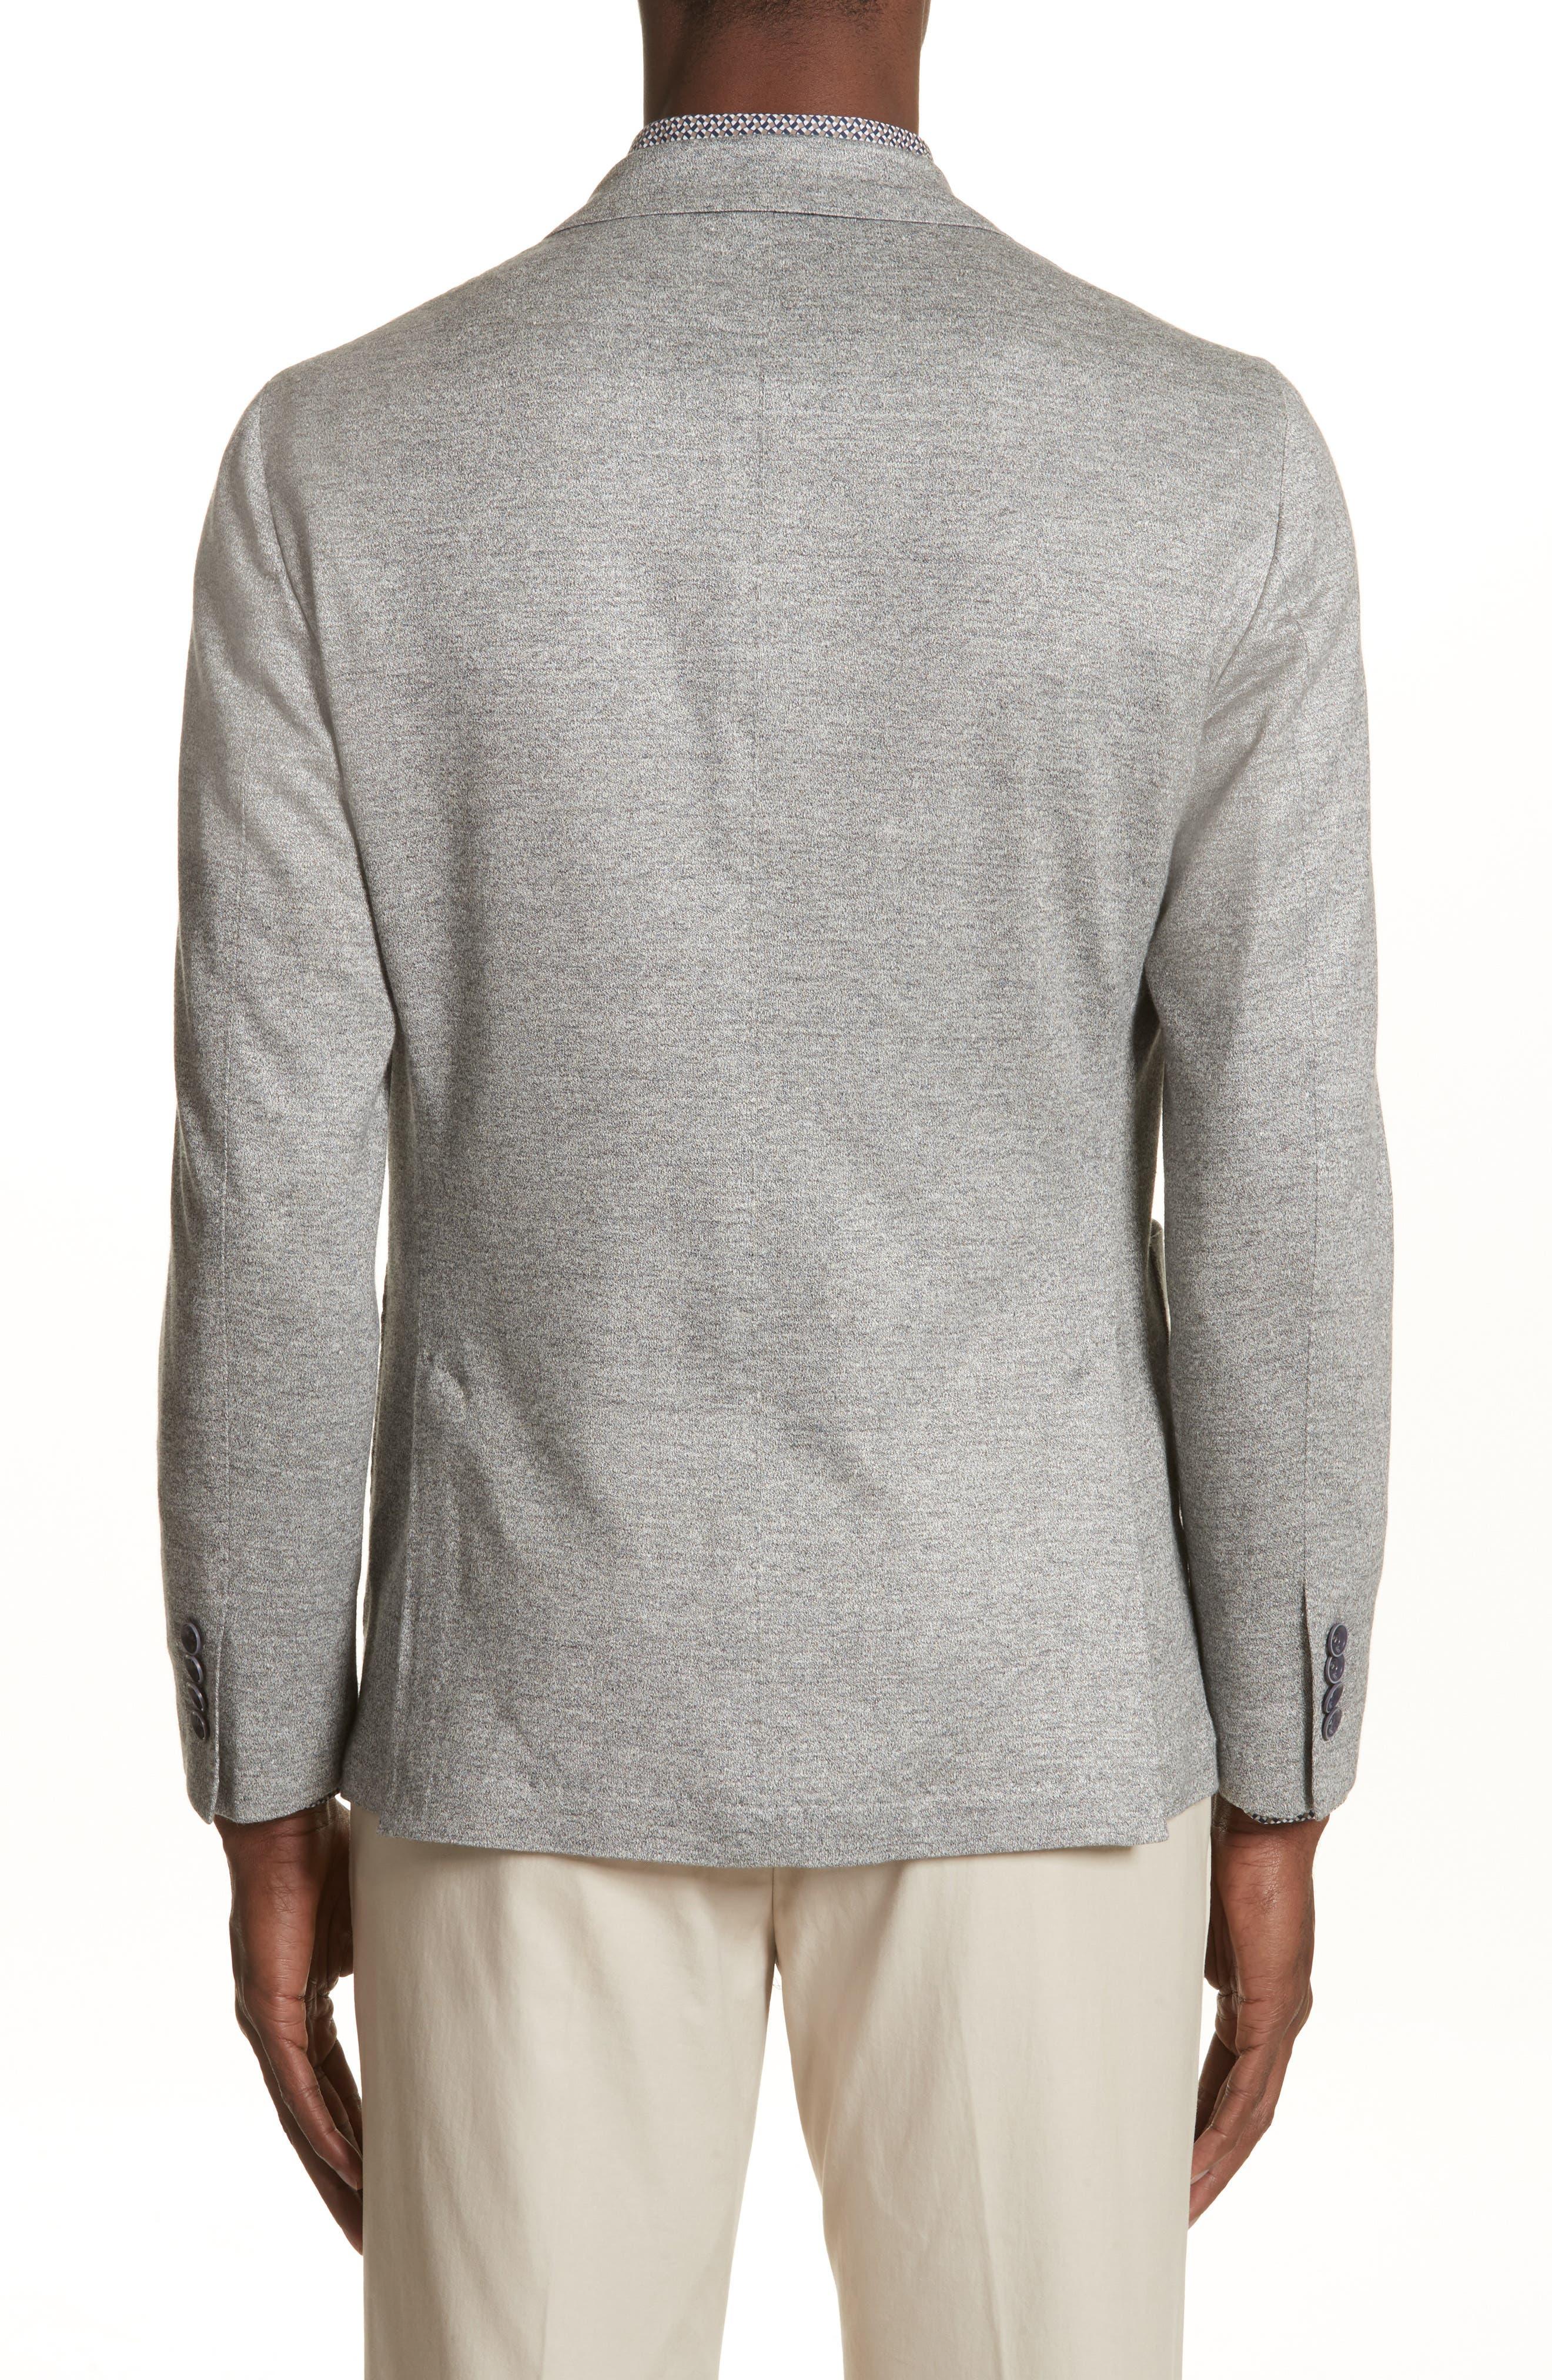 Trim Fit Washed Jersey Jacket,                             Alternate thumbnail 2, color,                             Light Grey